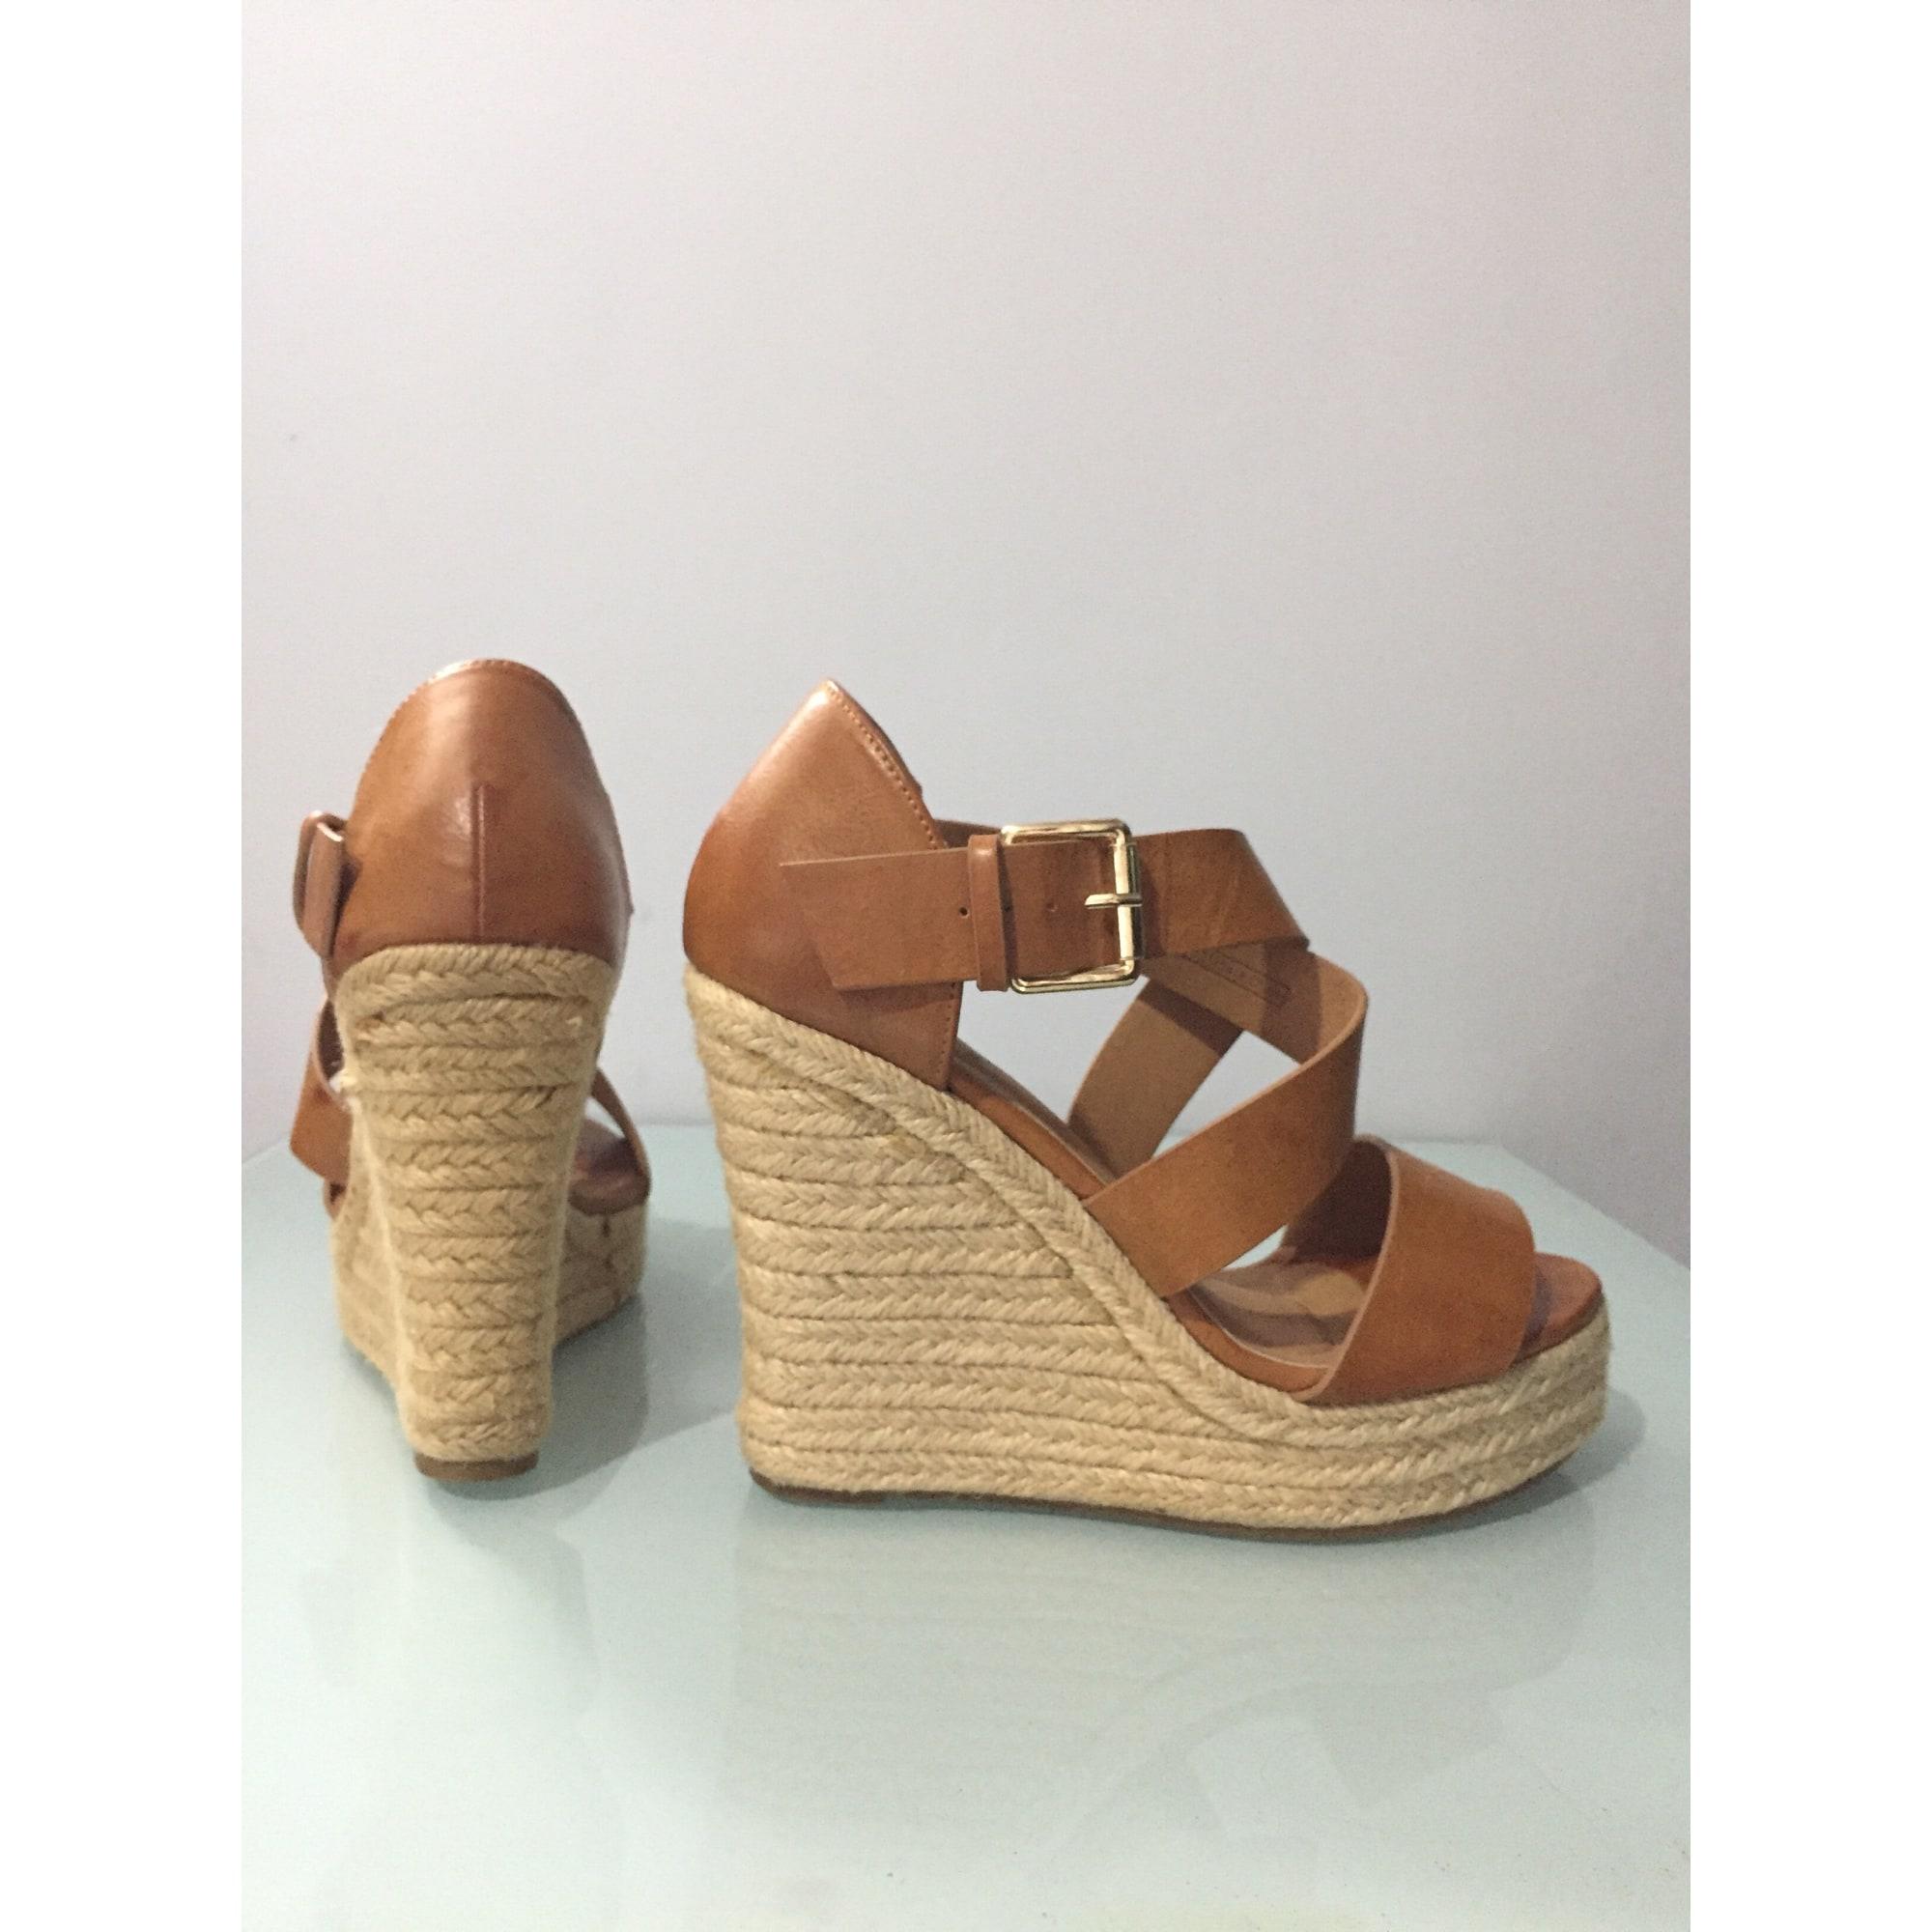 Sandales Compensées Pimkie 36 Beige 8095212